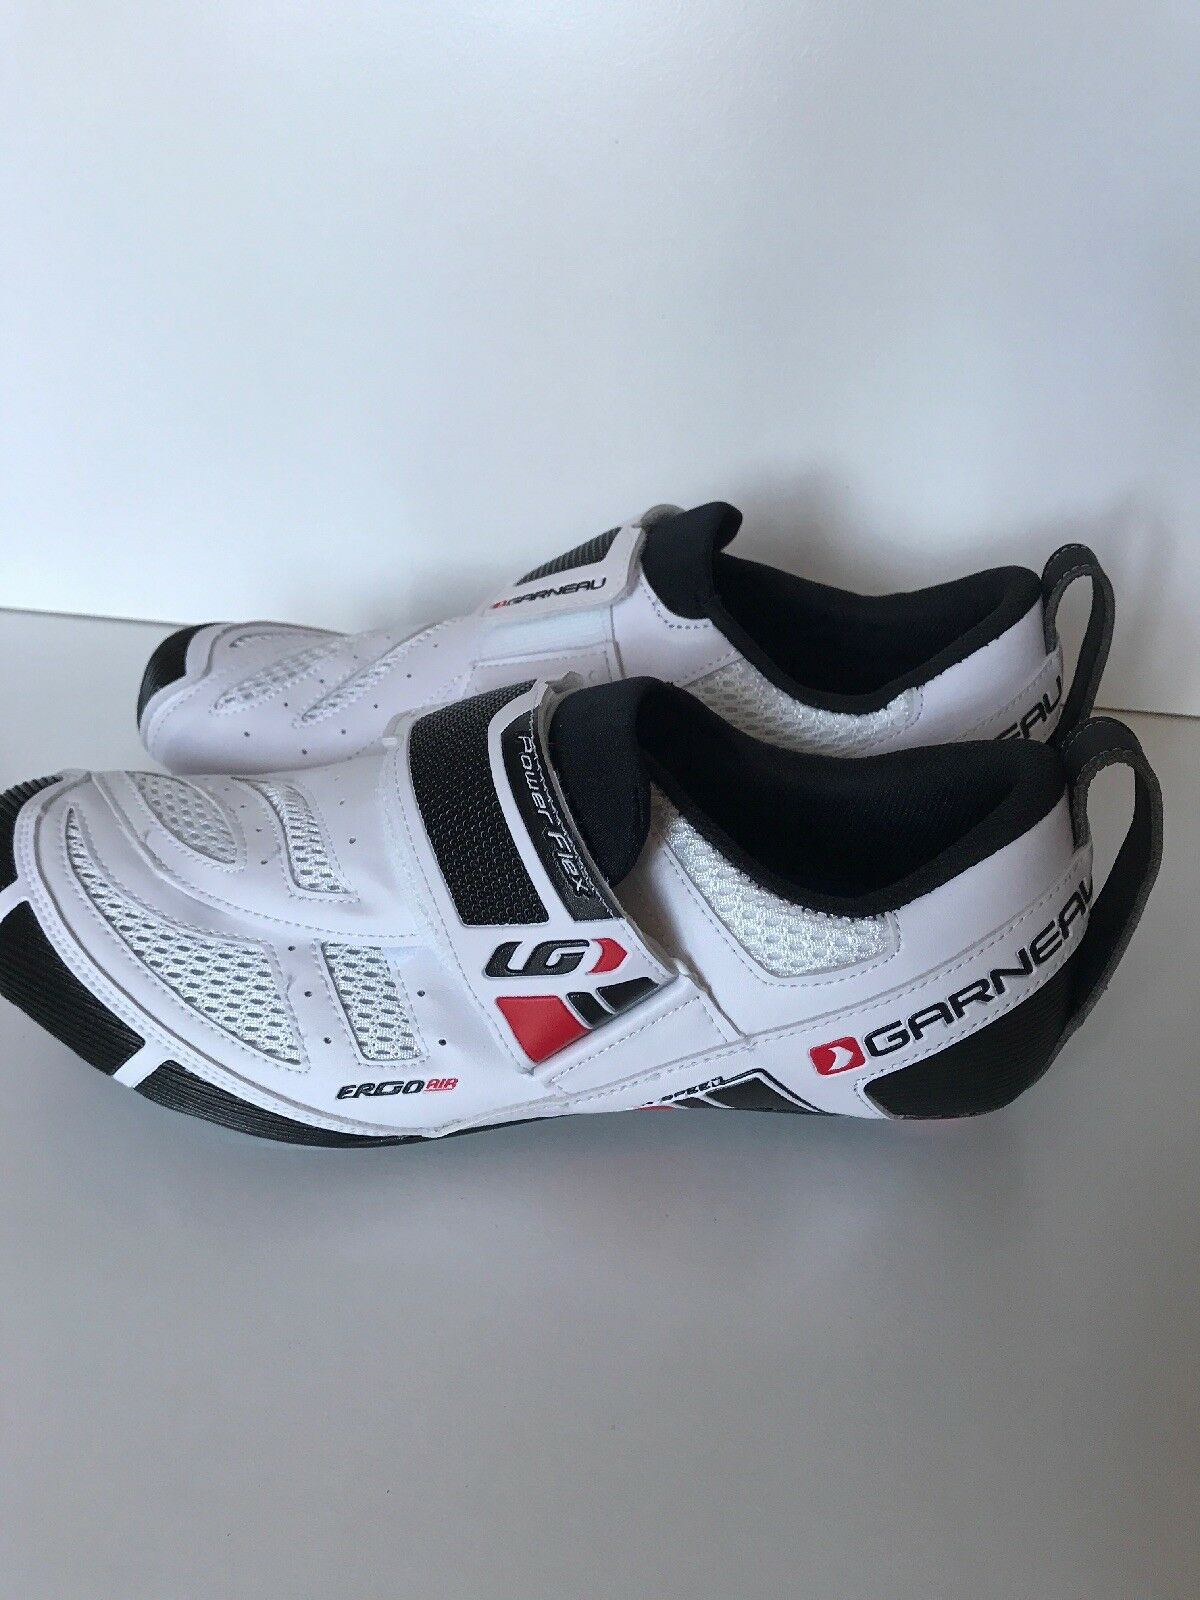 Louis Garneau Men's Tri X Speed Triathlon  White Cycling shoes 47 EU    12.5 US